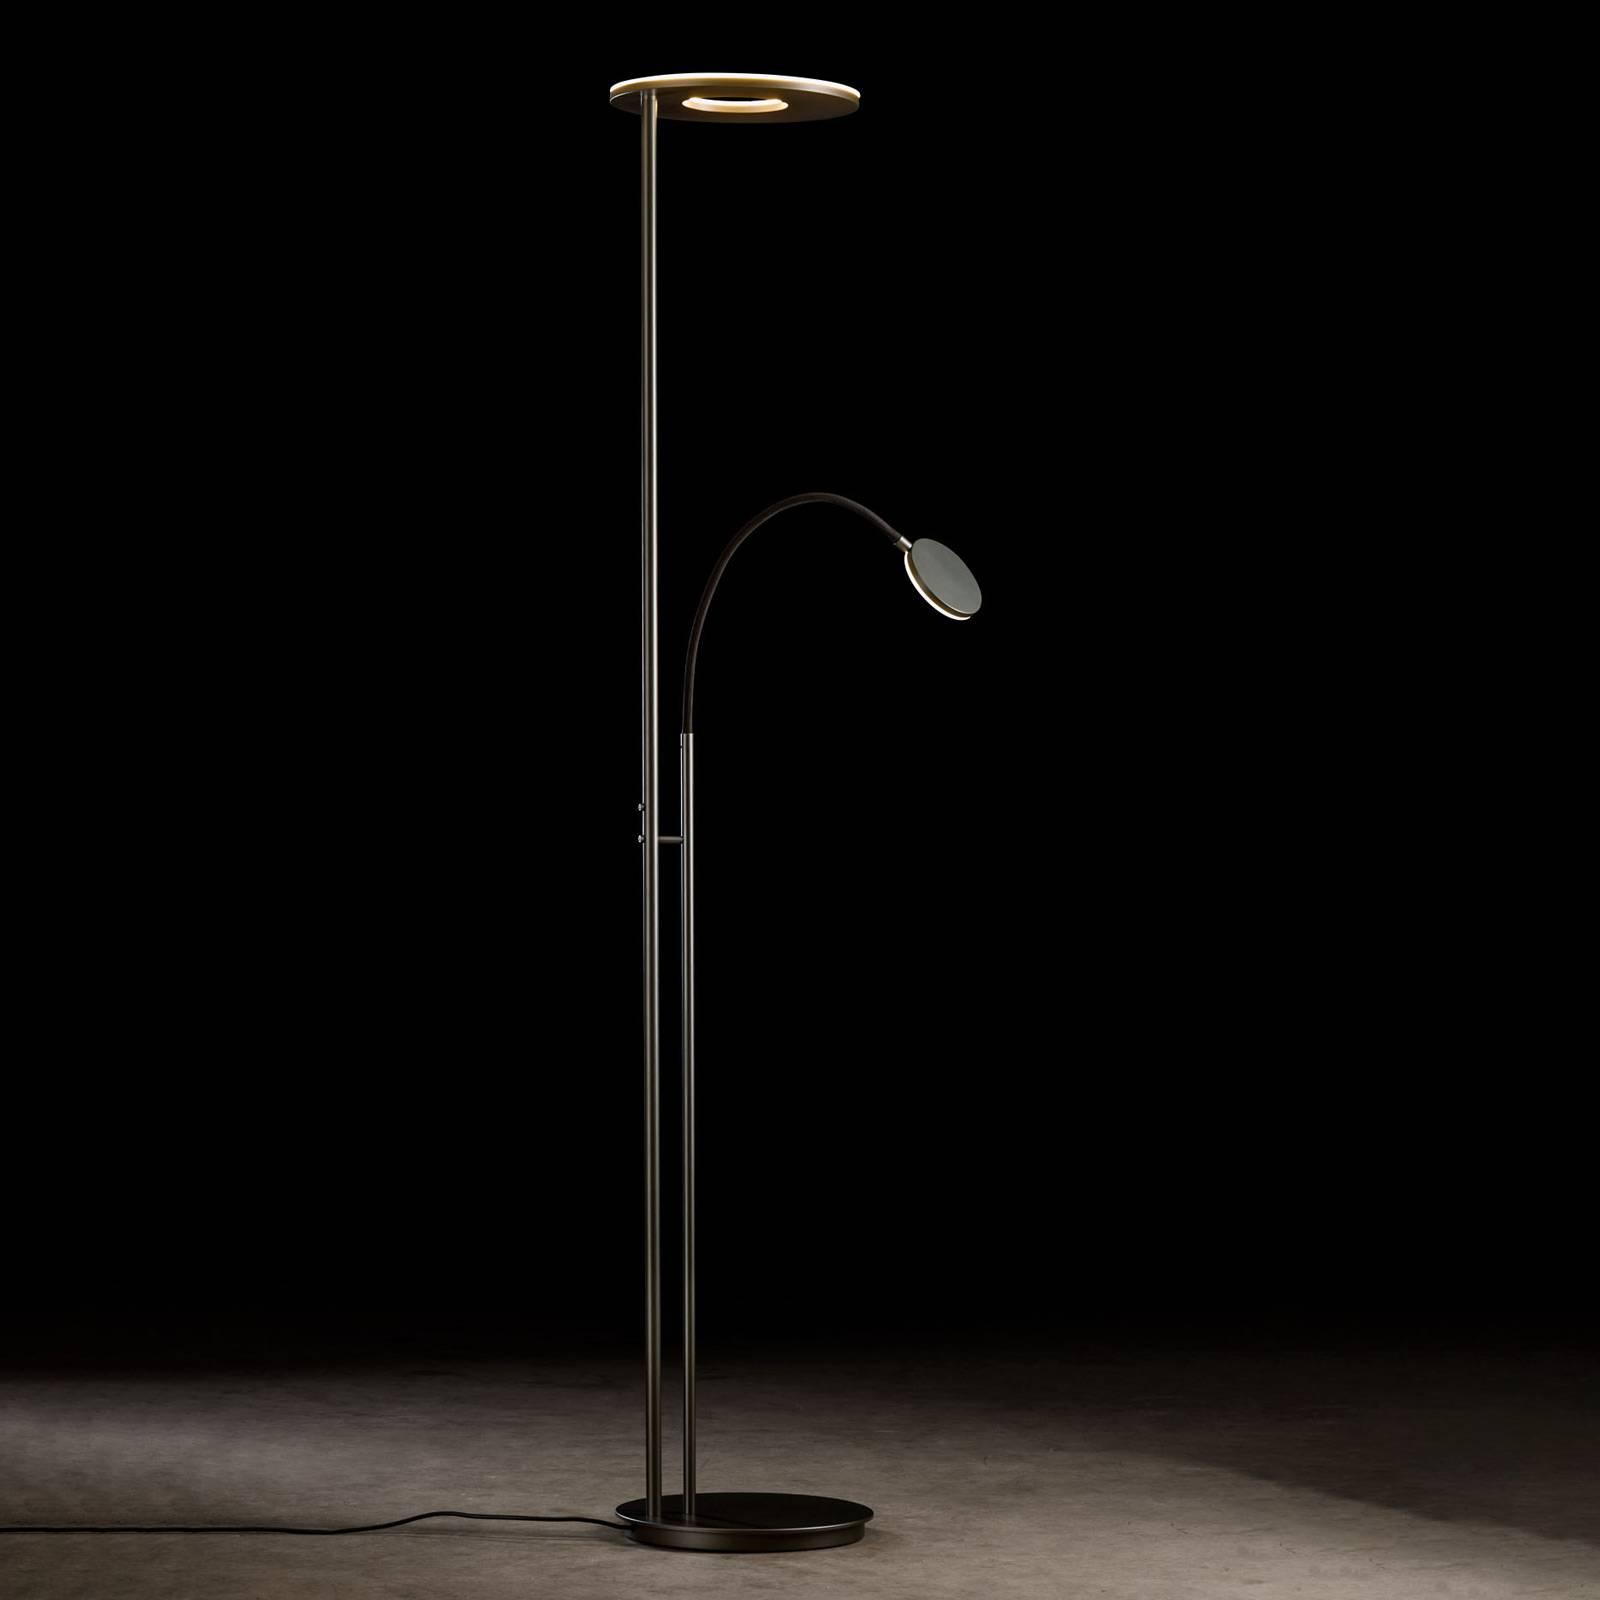 Holtkötter Nova Flex lampa oświetlająca sufit